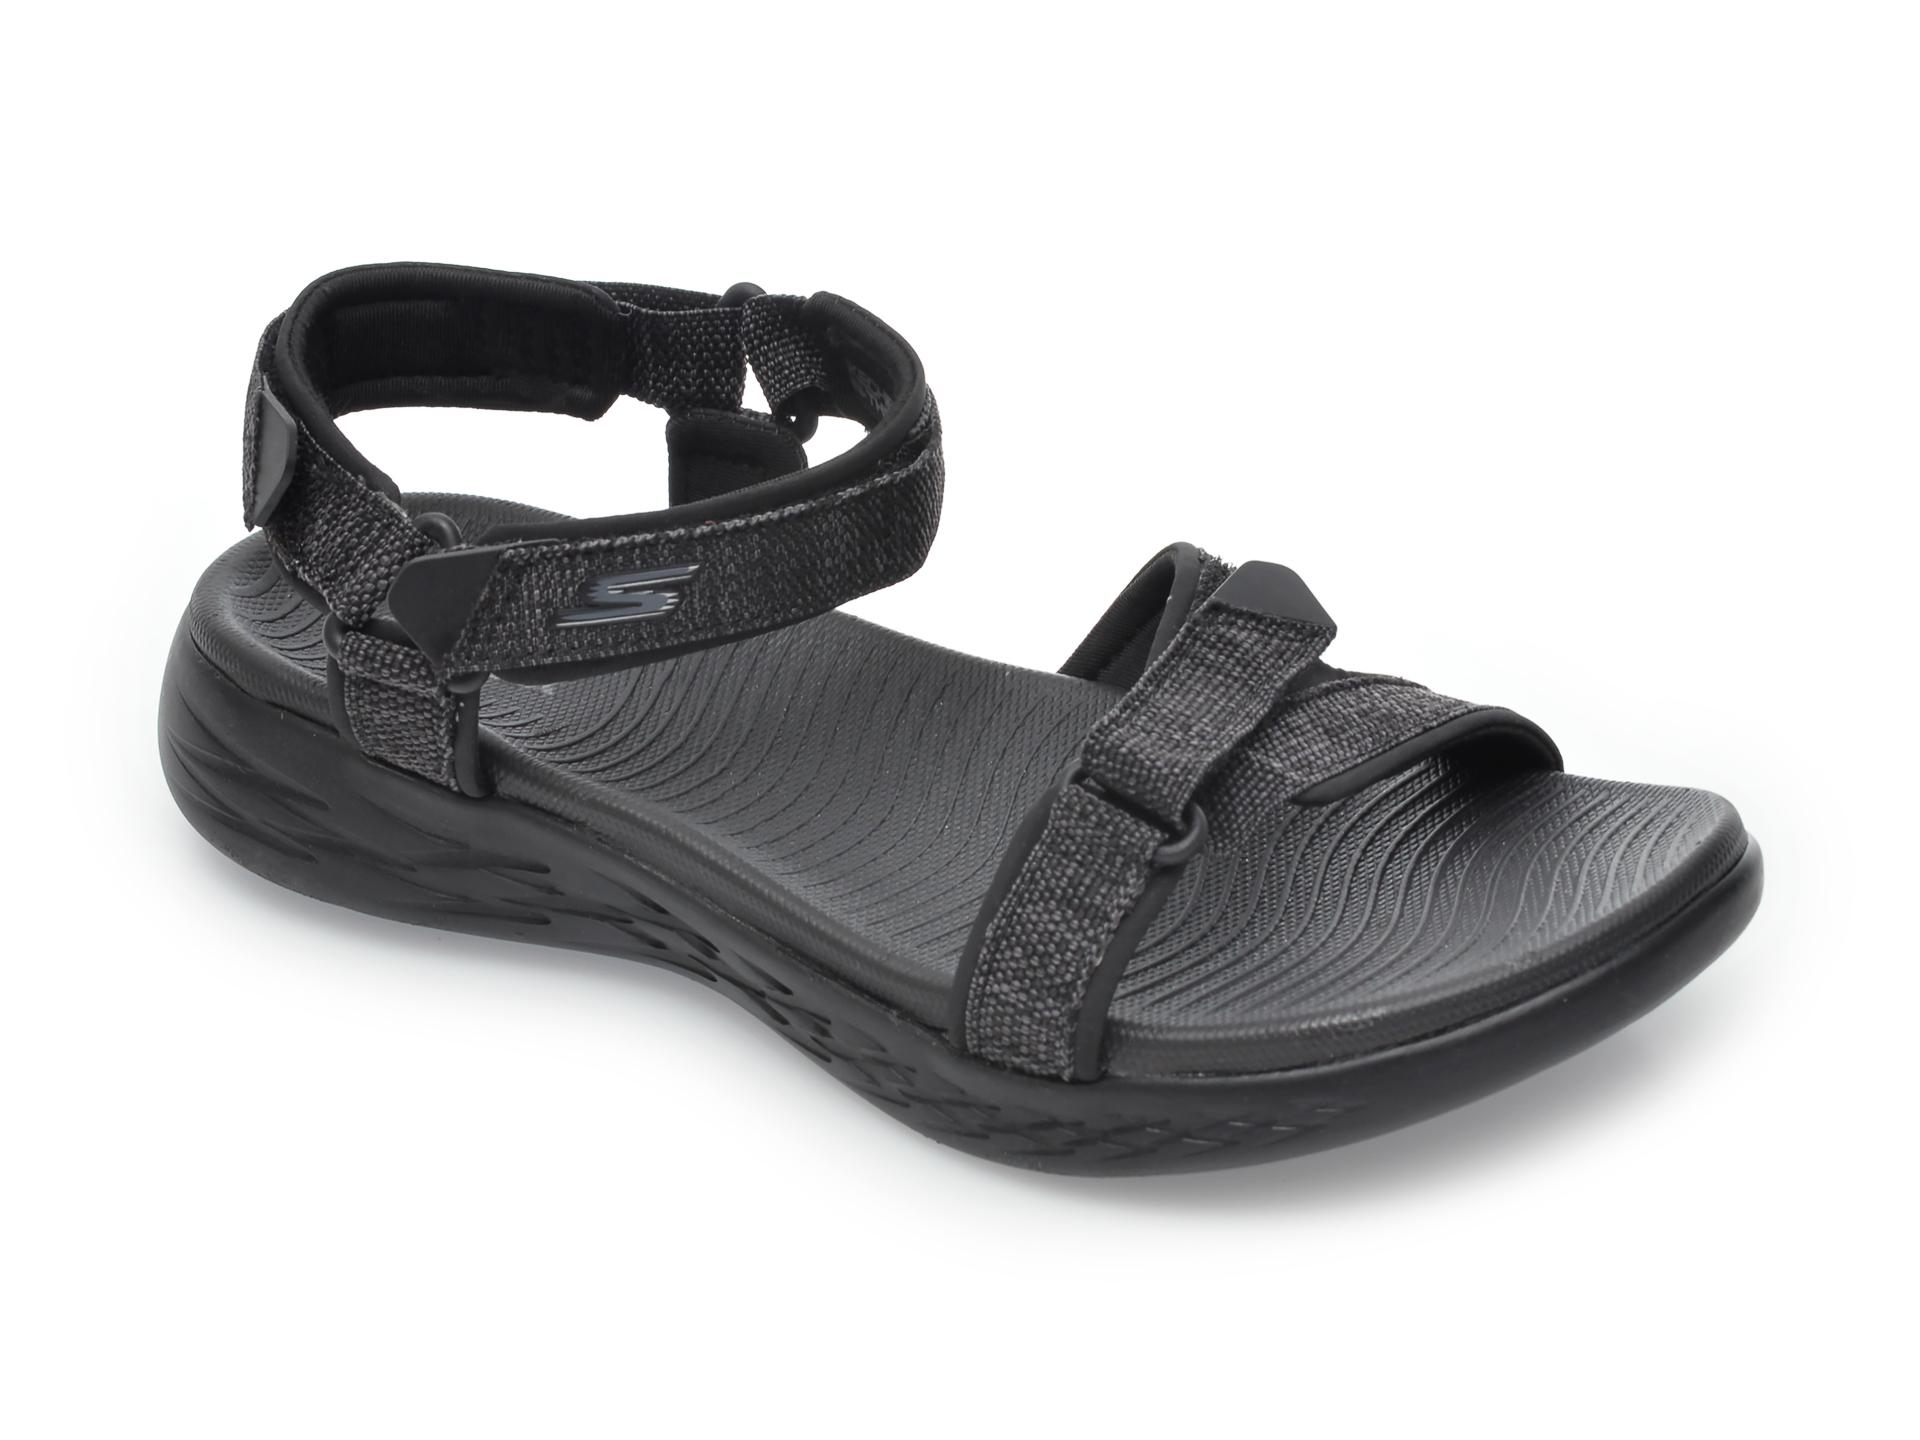 Sandale SKECHERS negre, On-The-Go, din material textil New